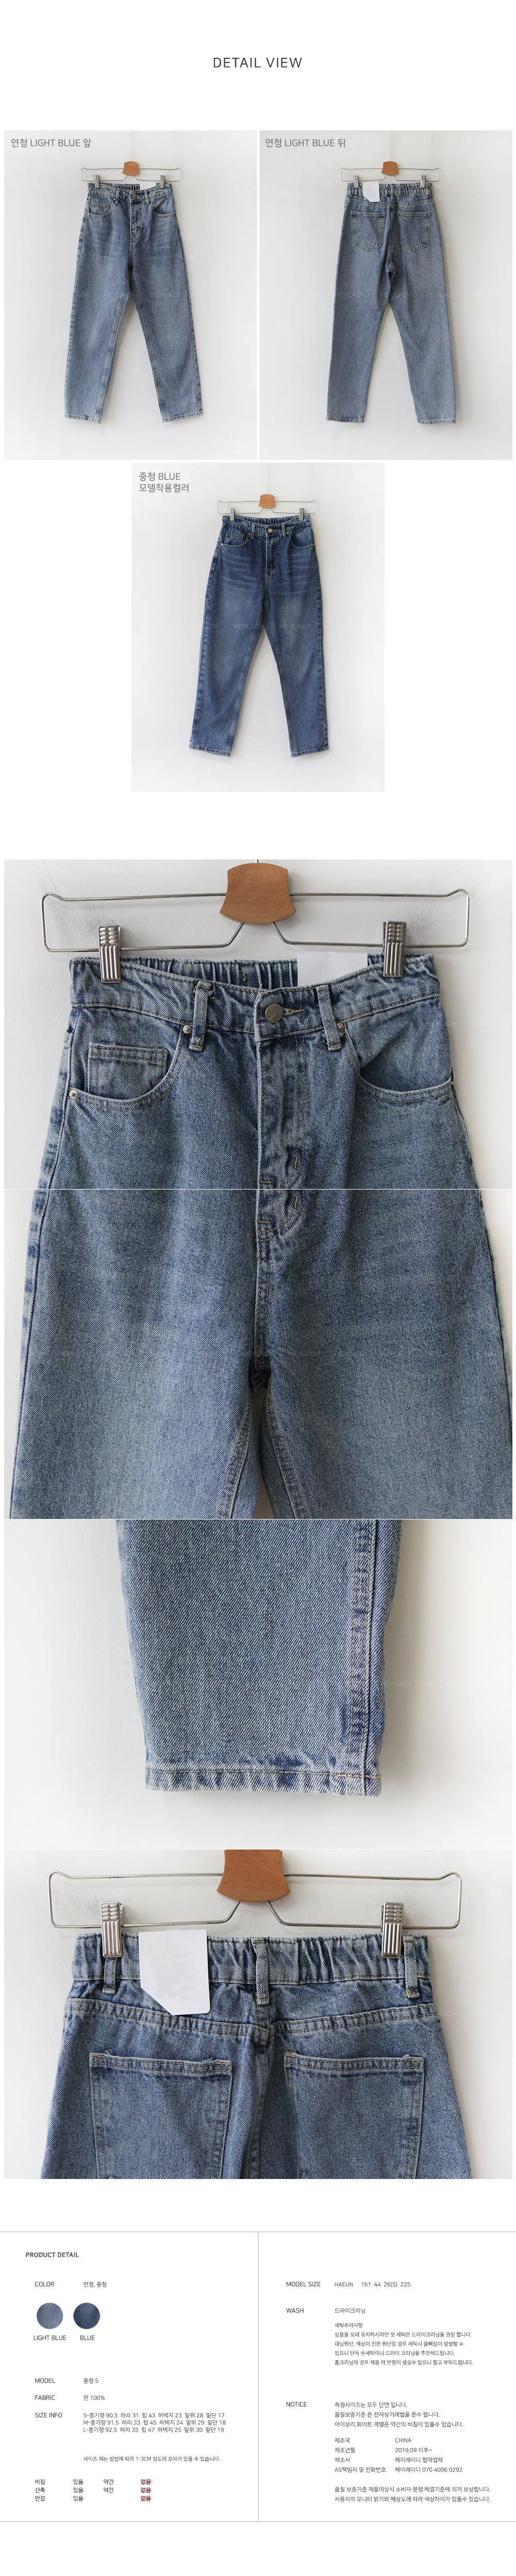 Meyer Banding Denim Pants